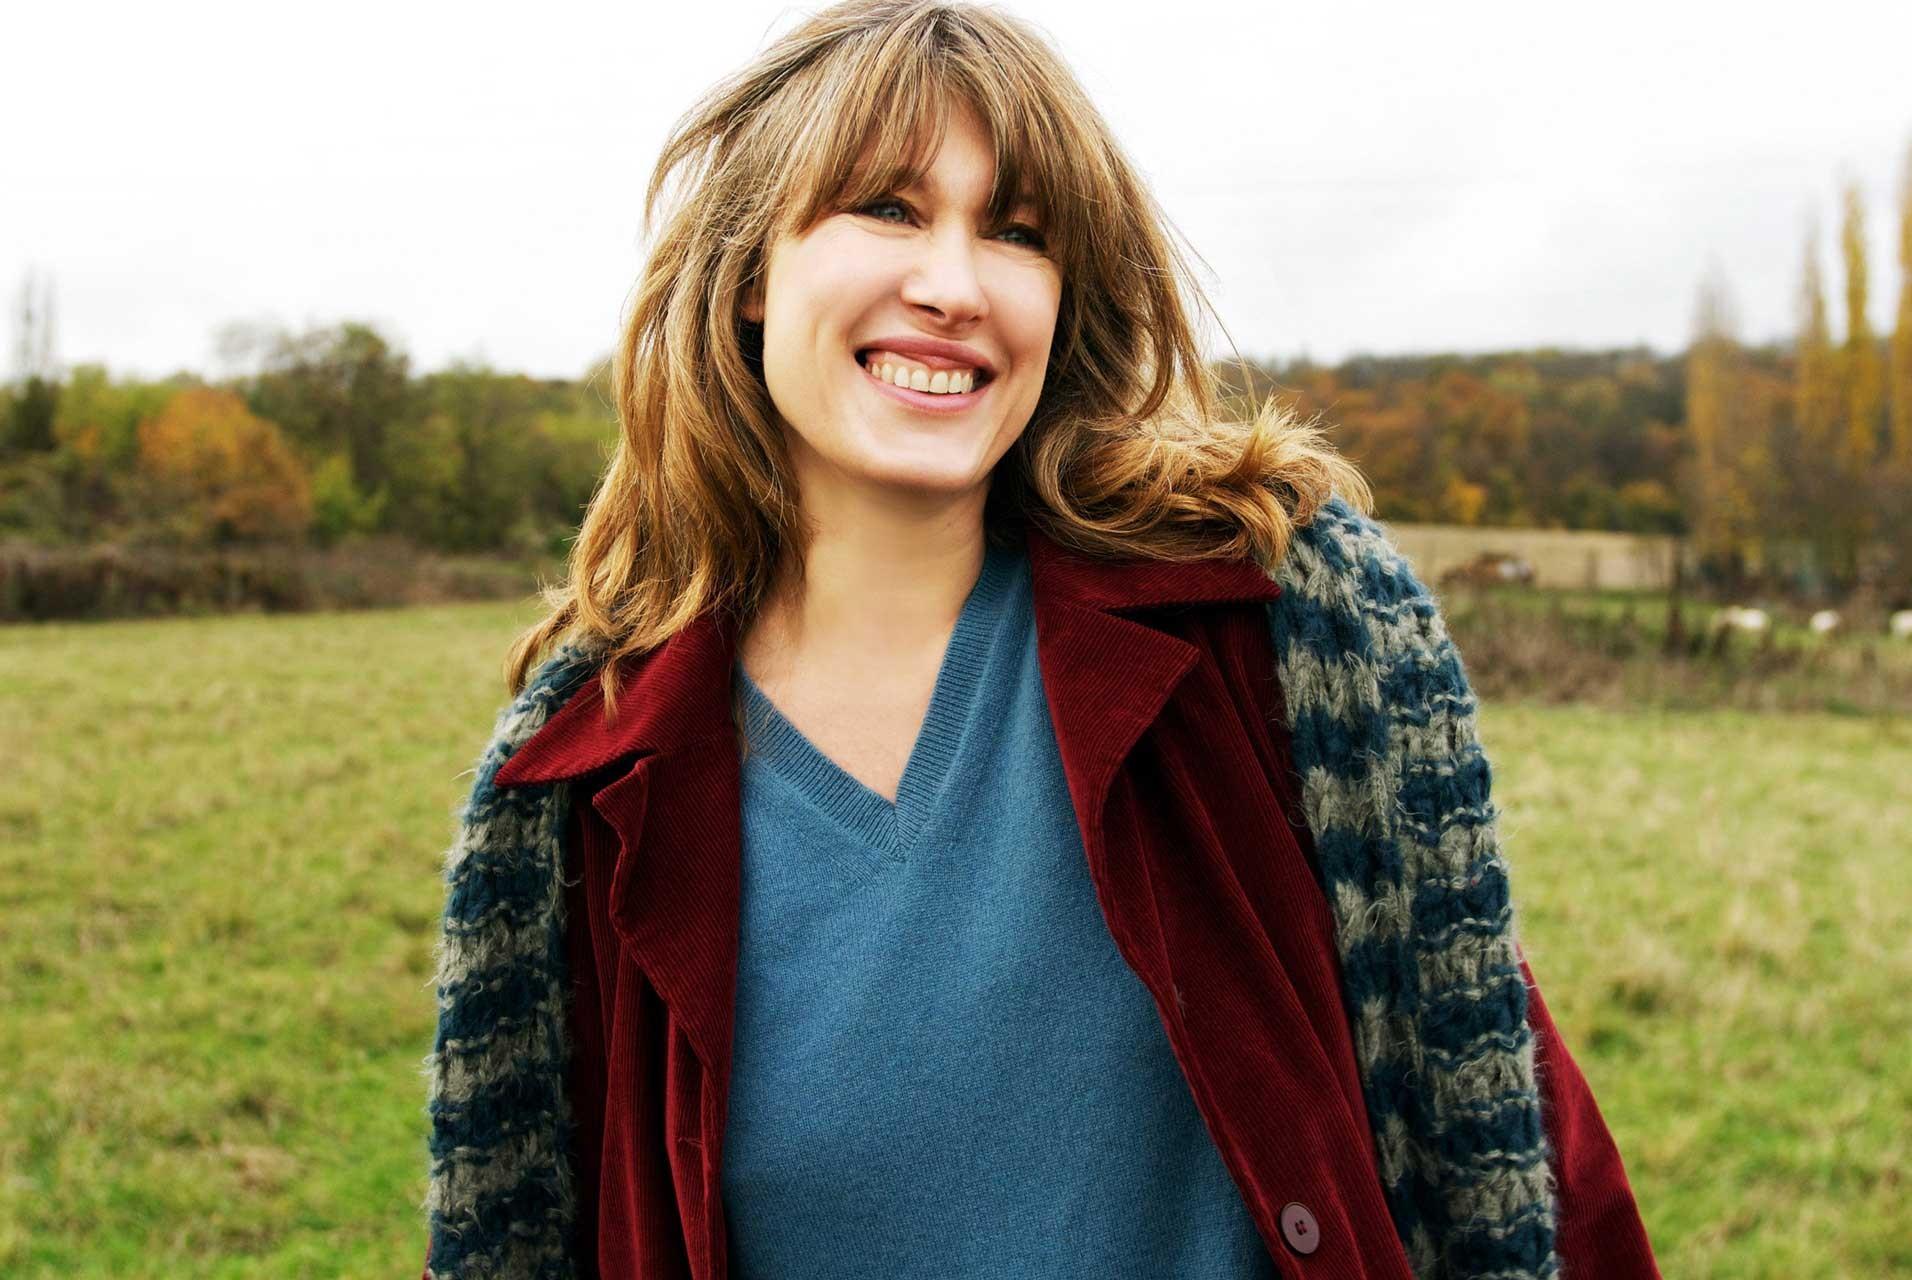 Laure-Maud_photographe_portrait_14_Nicole-Pache_3